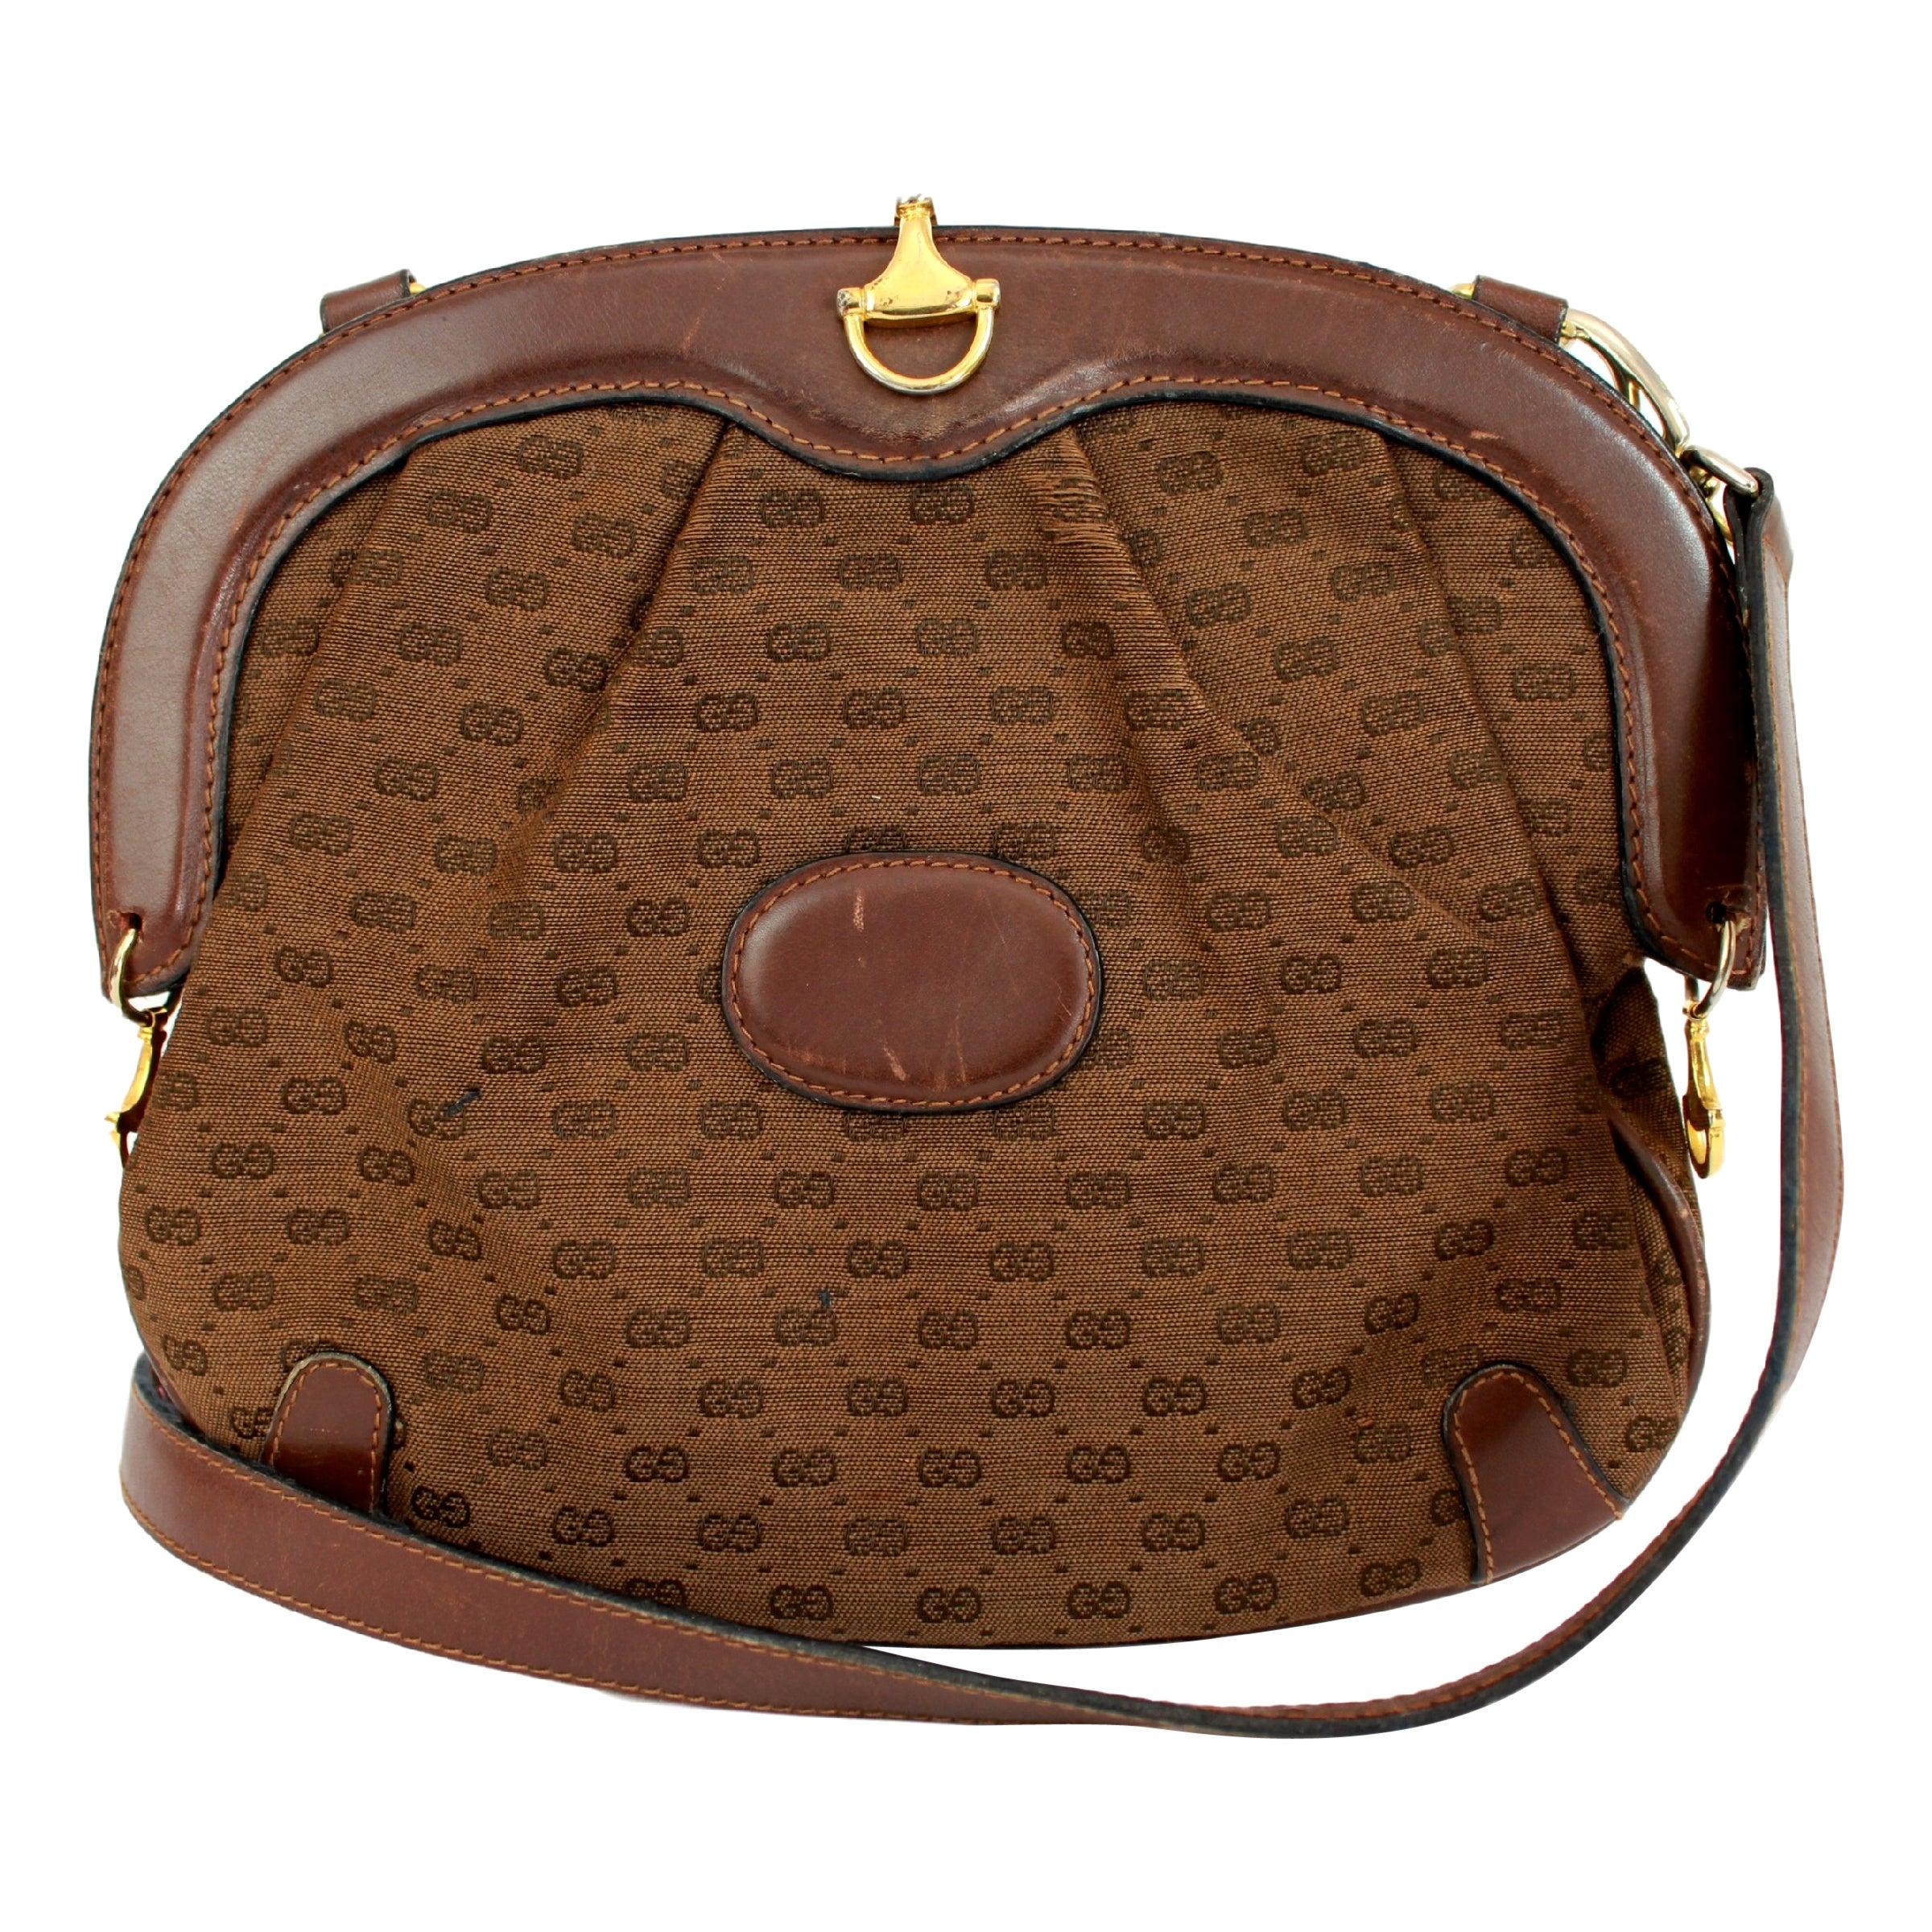 7bd4c1c5f7c69 1980s Gucci Letaher Canvas Brown Clutch Monogram Shoulder Bag